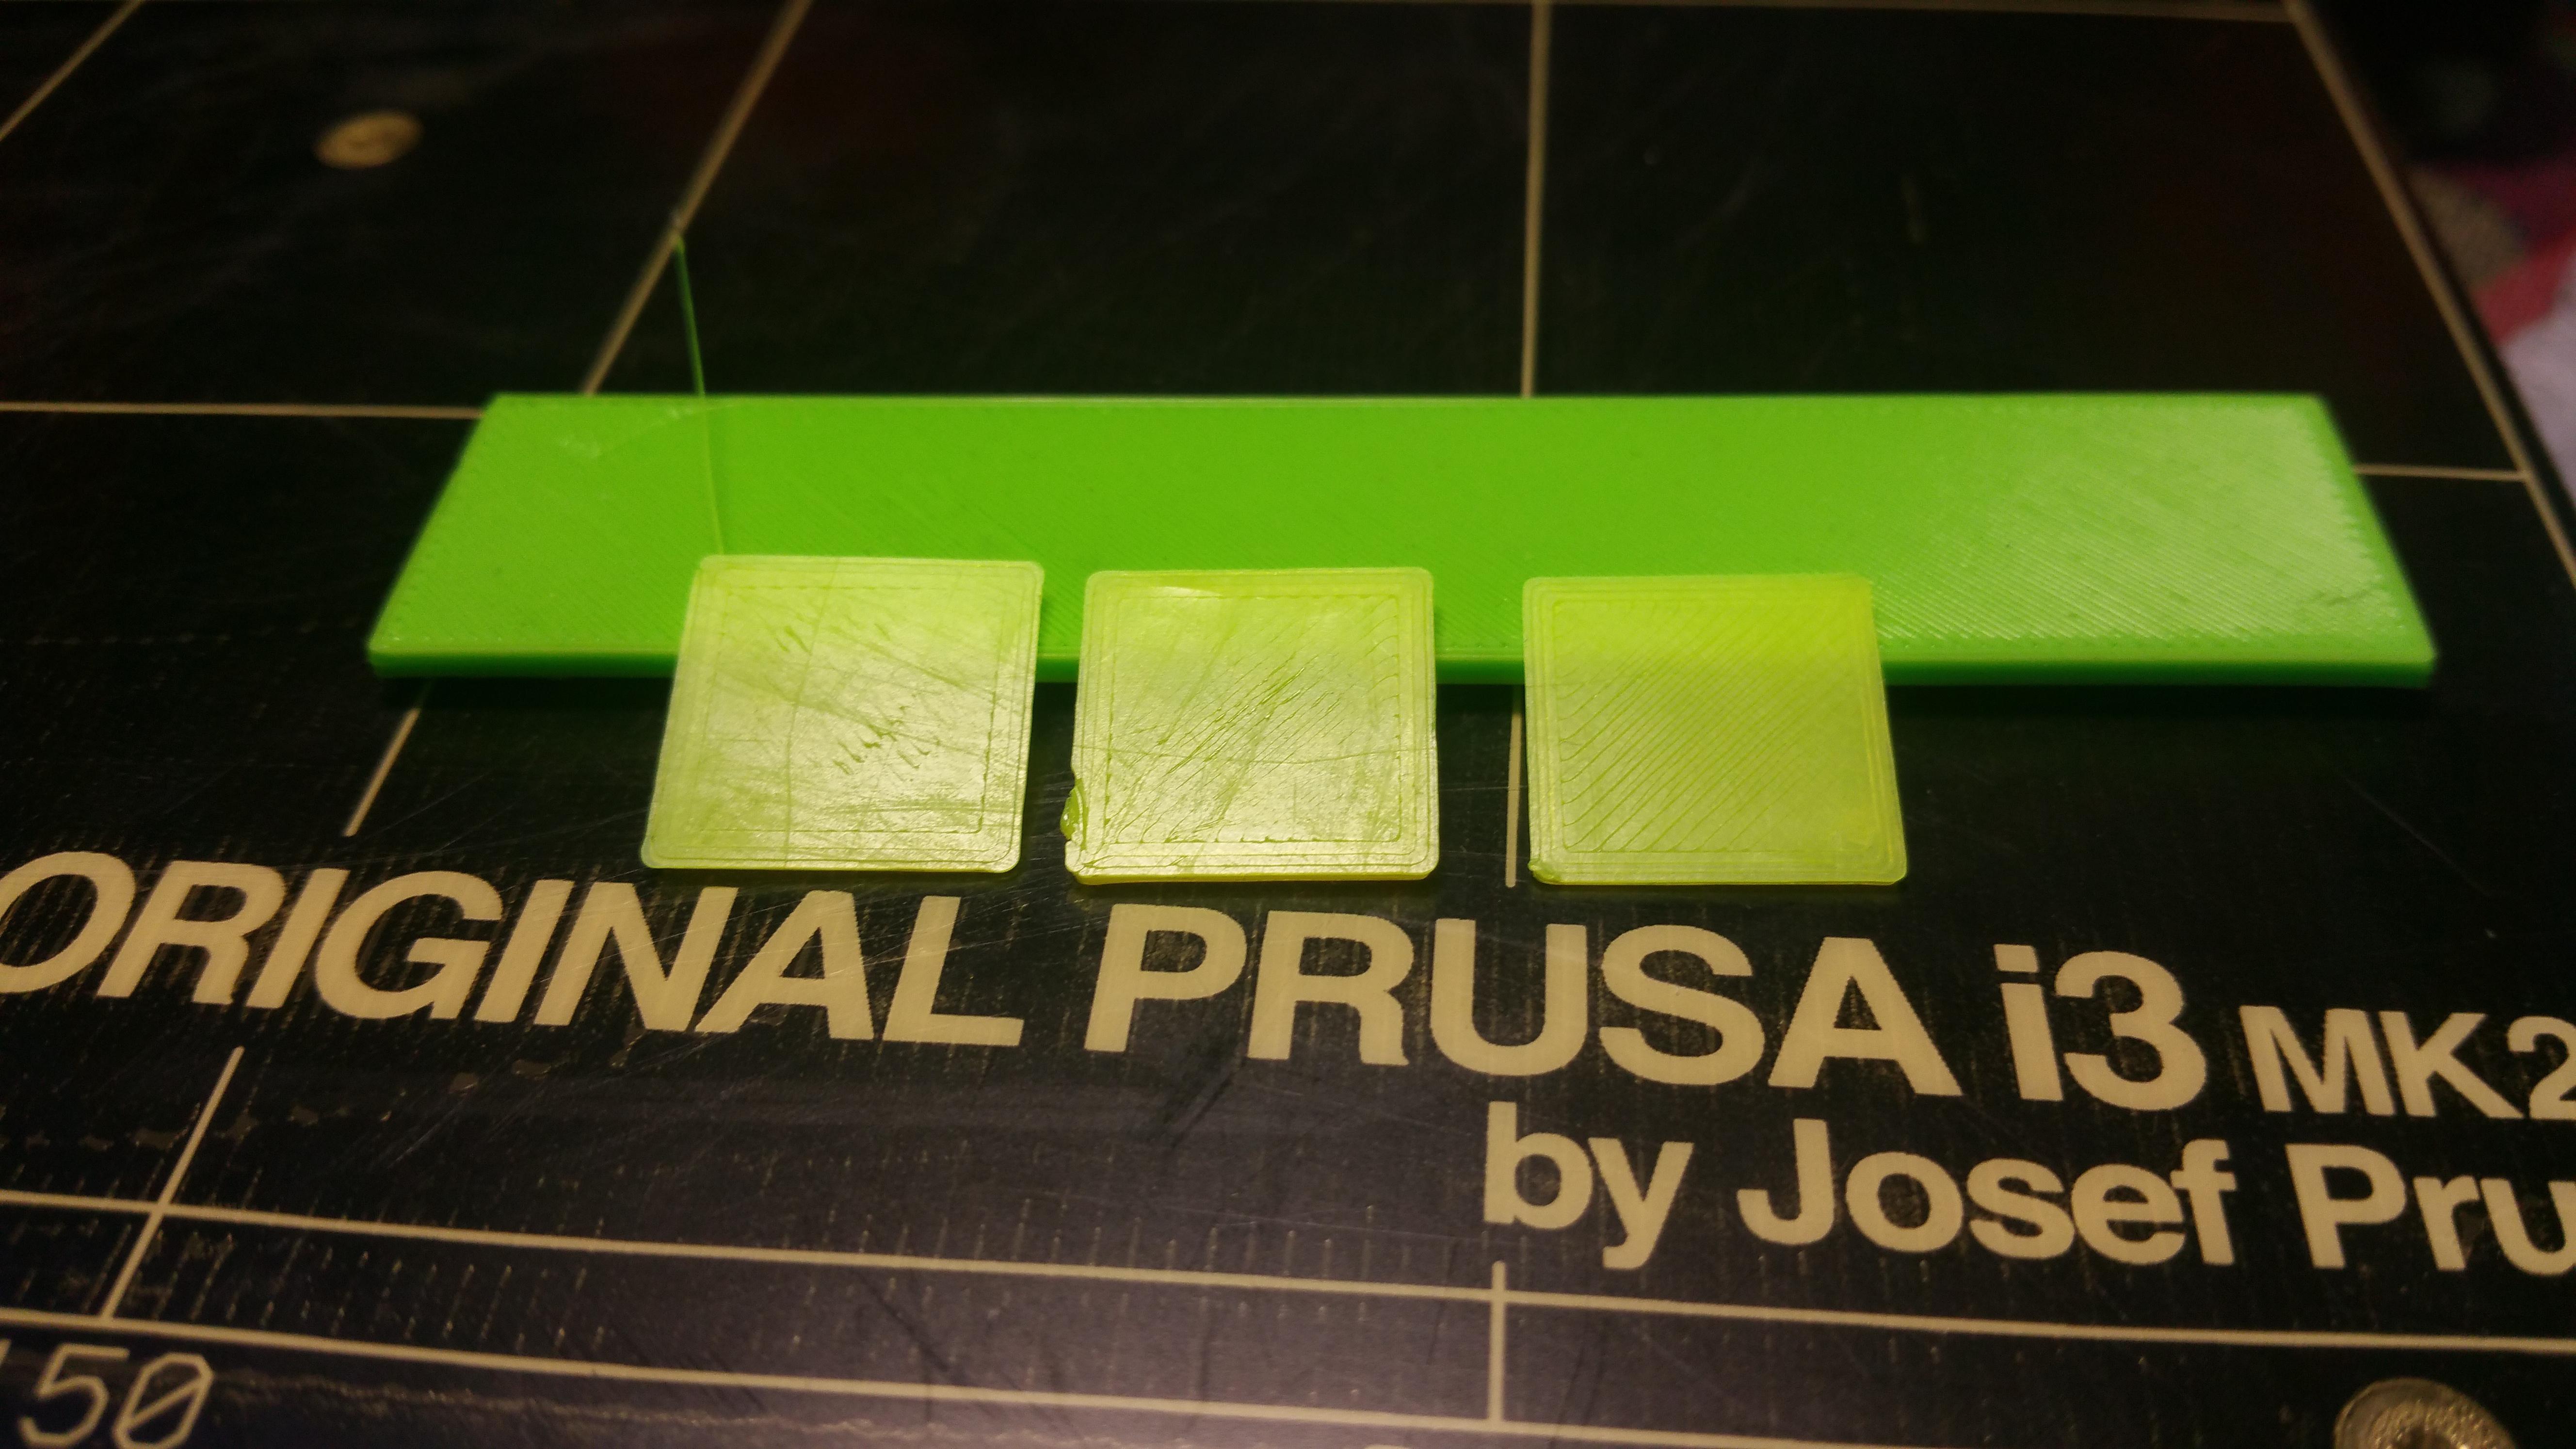 Prusa i3 mk2 colorfabb HT filament - 3D Printing / 3D